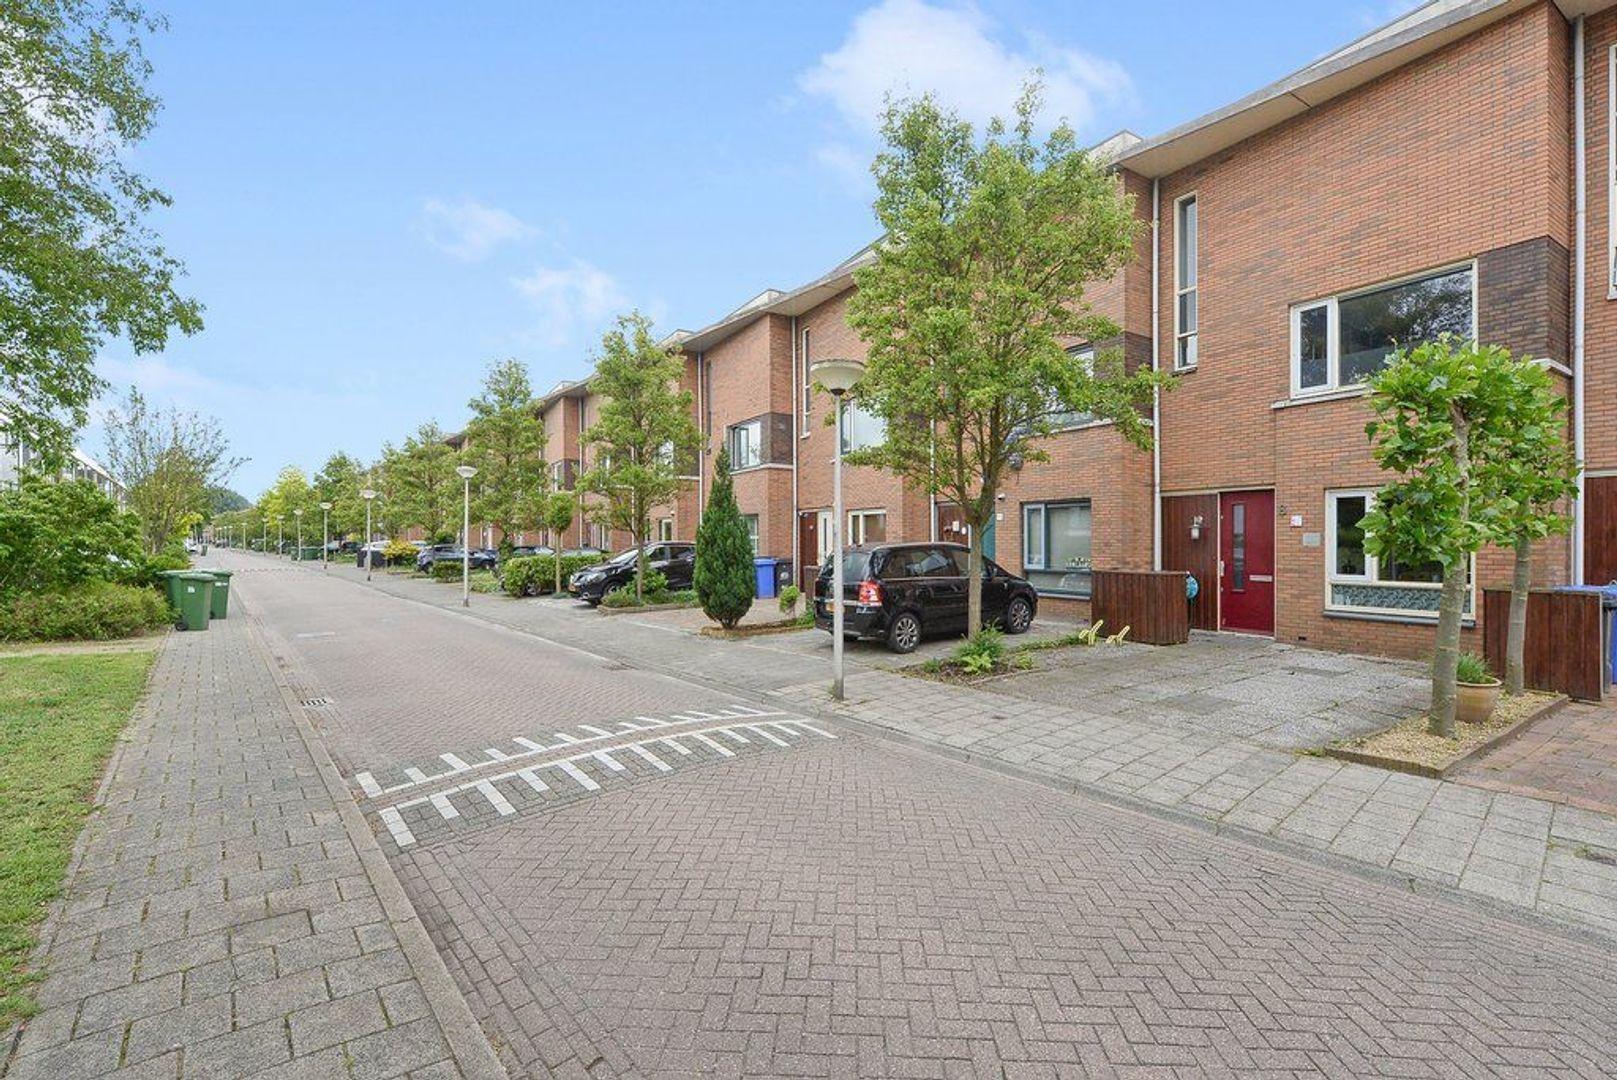 Raad van Europalaan 8, Delft foto-1